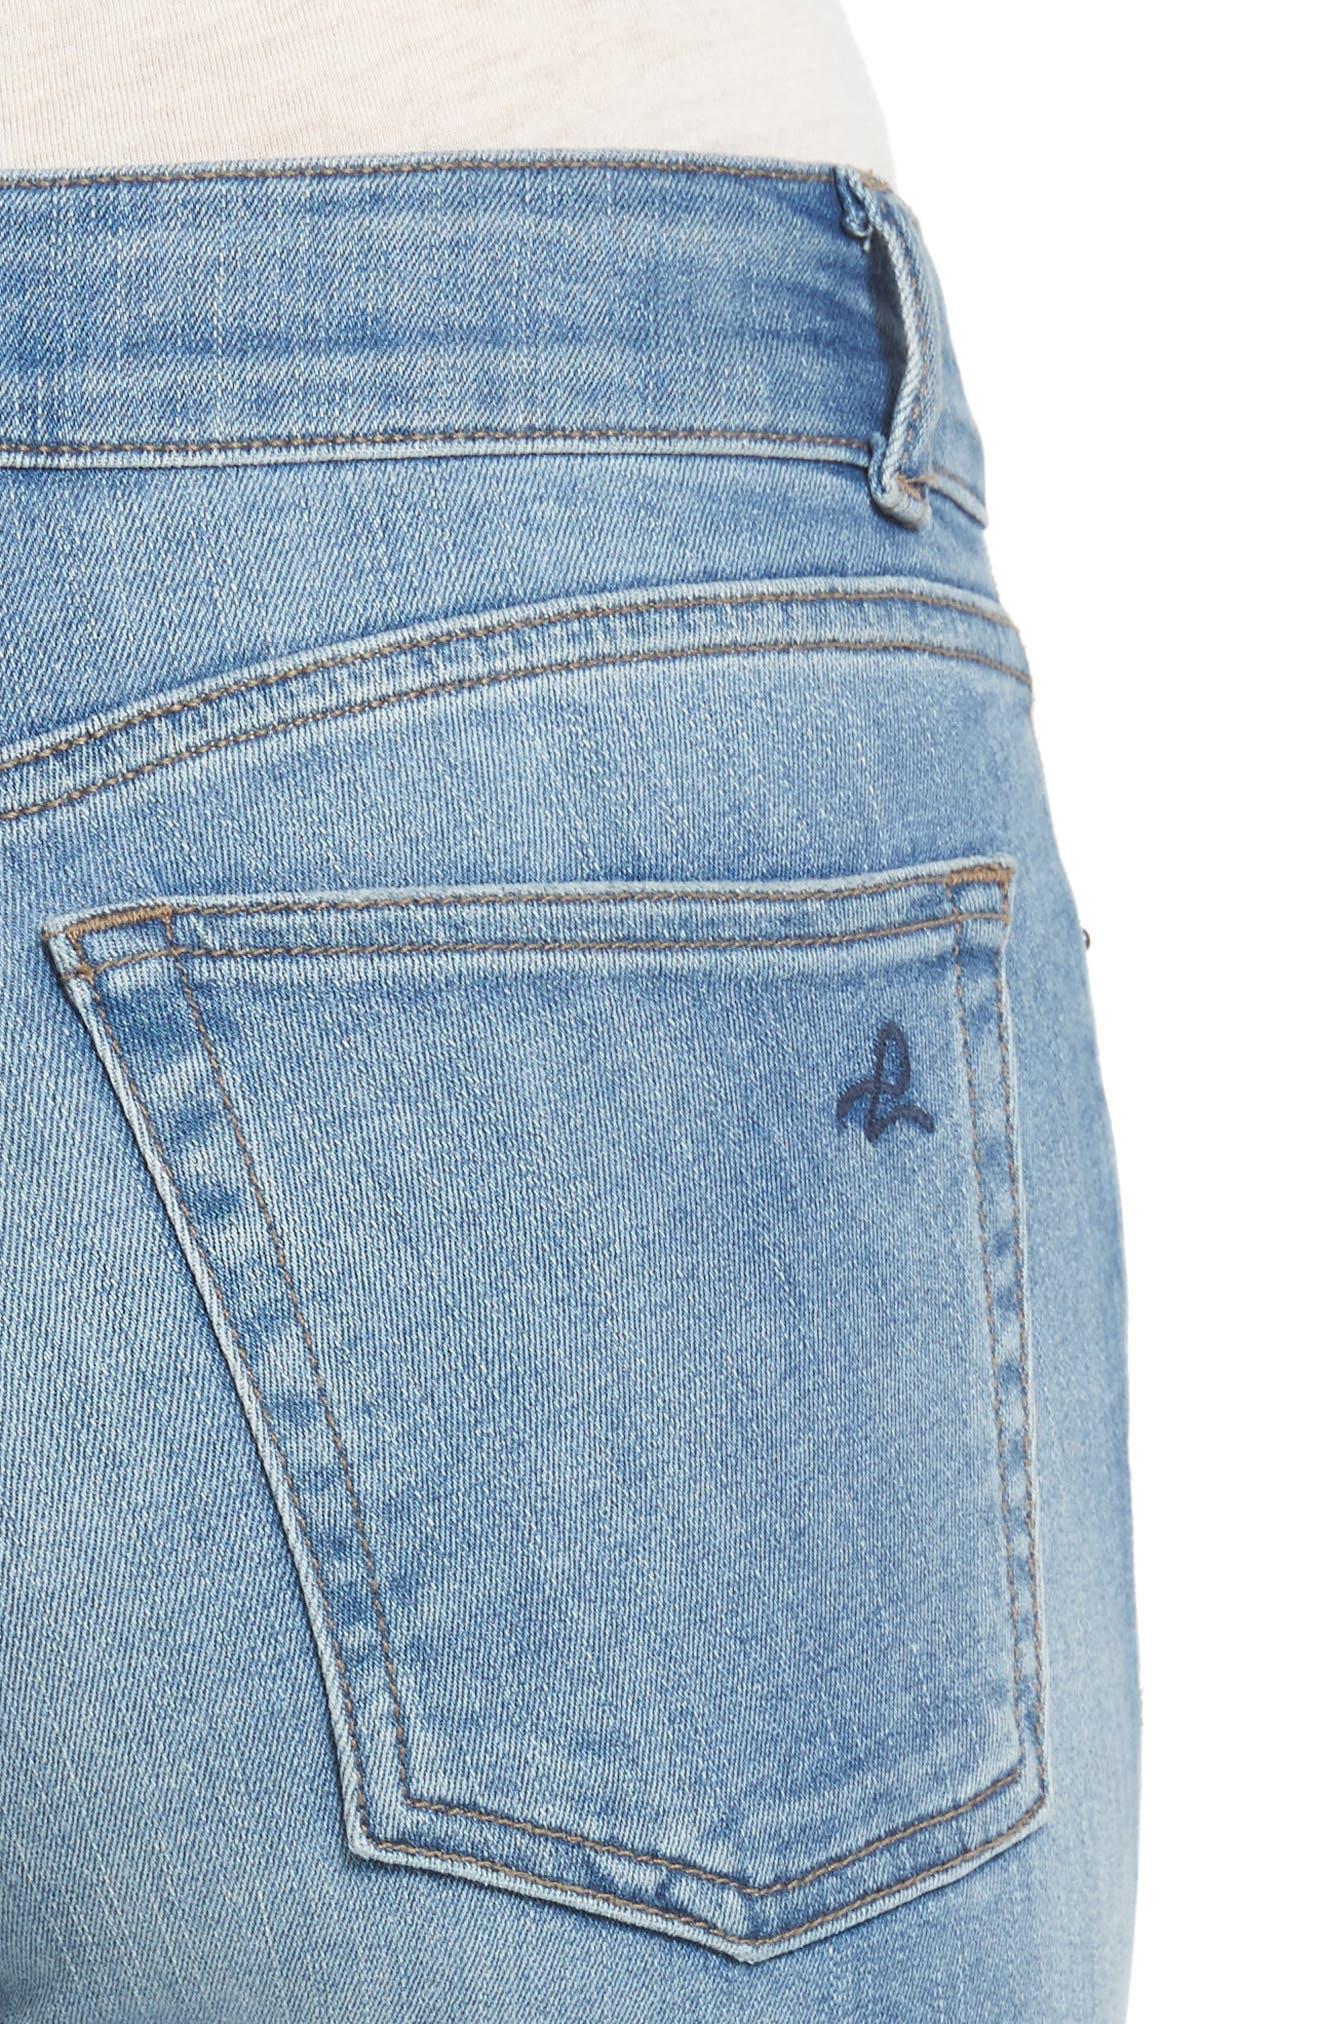 Florence Instasculpt Skinny Jeans,                             Alternate thumbnail 4, color,                             430